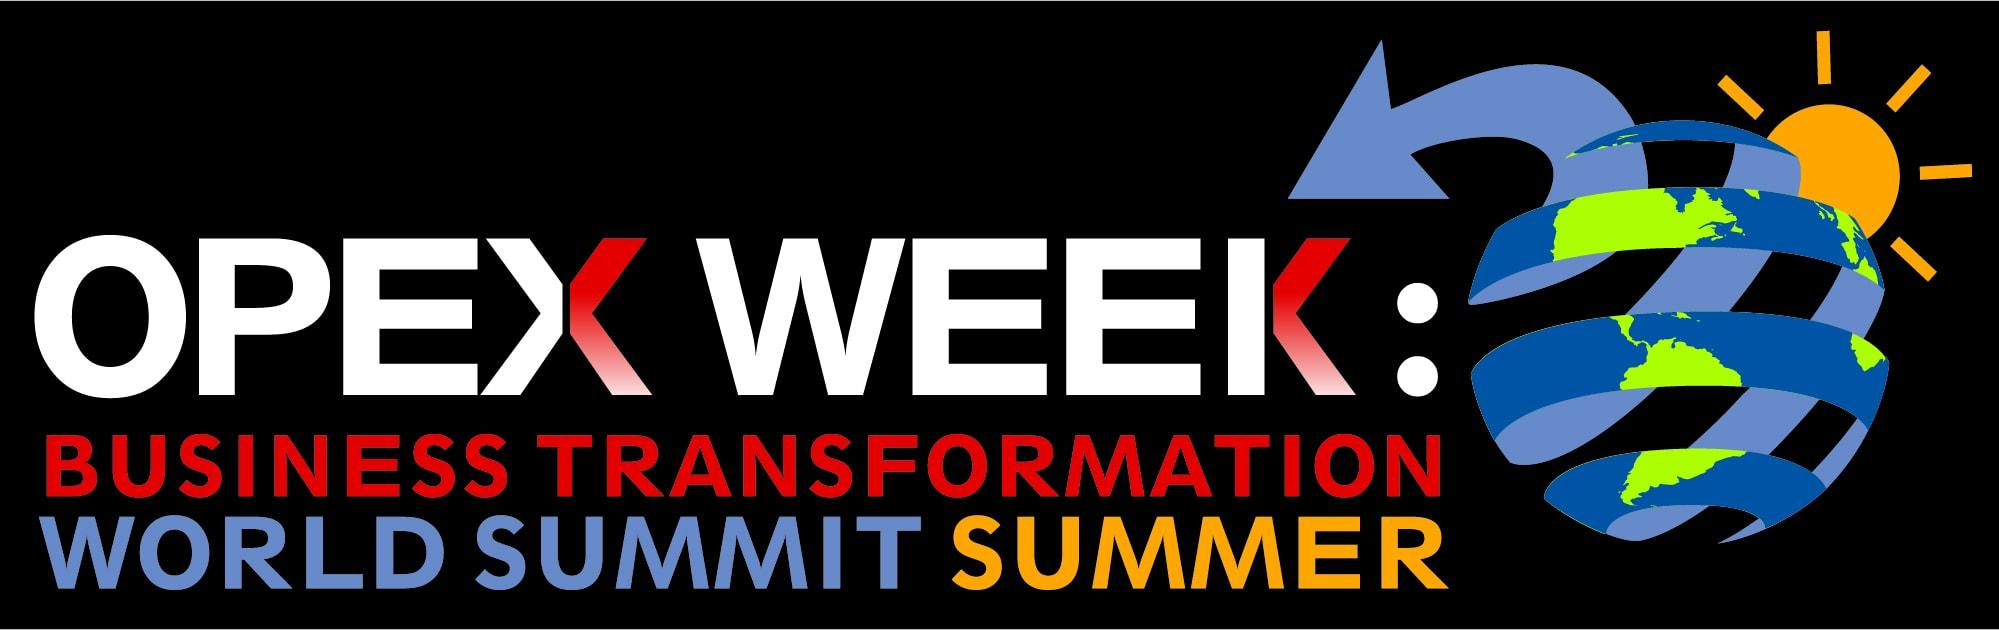 OPEX Week Summer 2020 logo